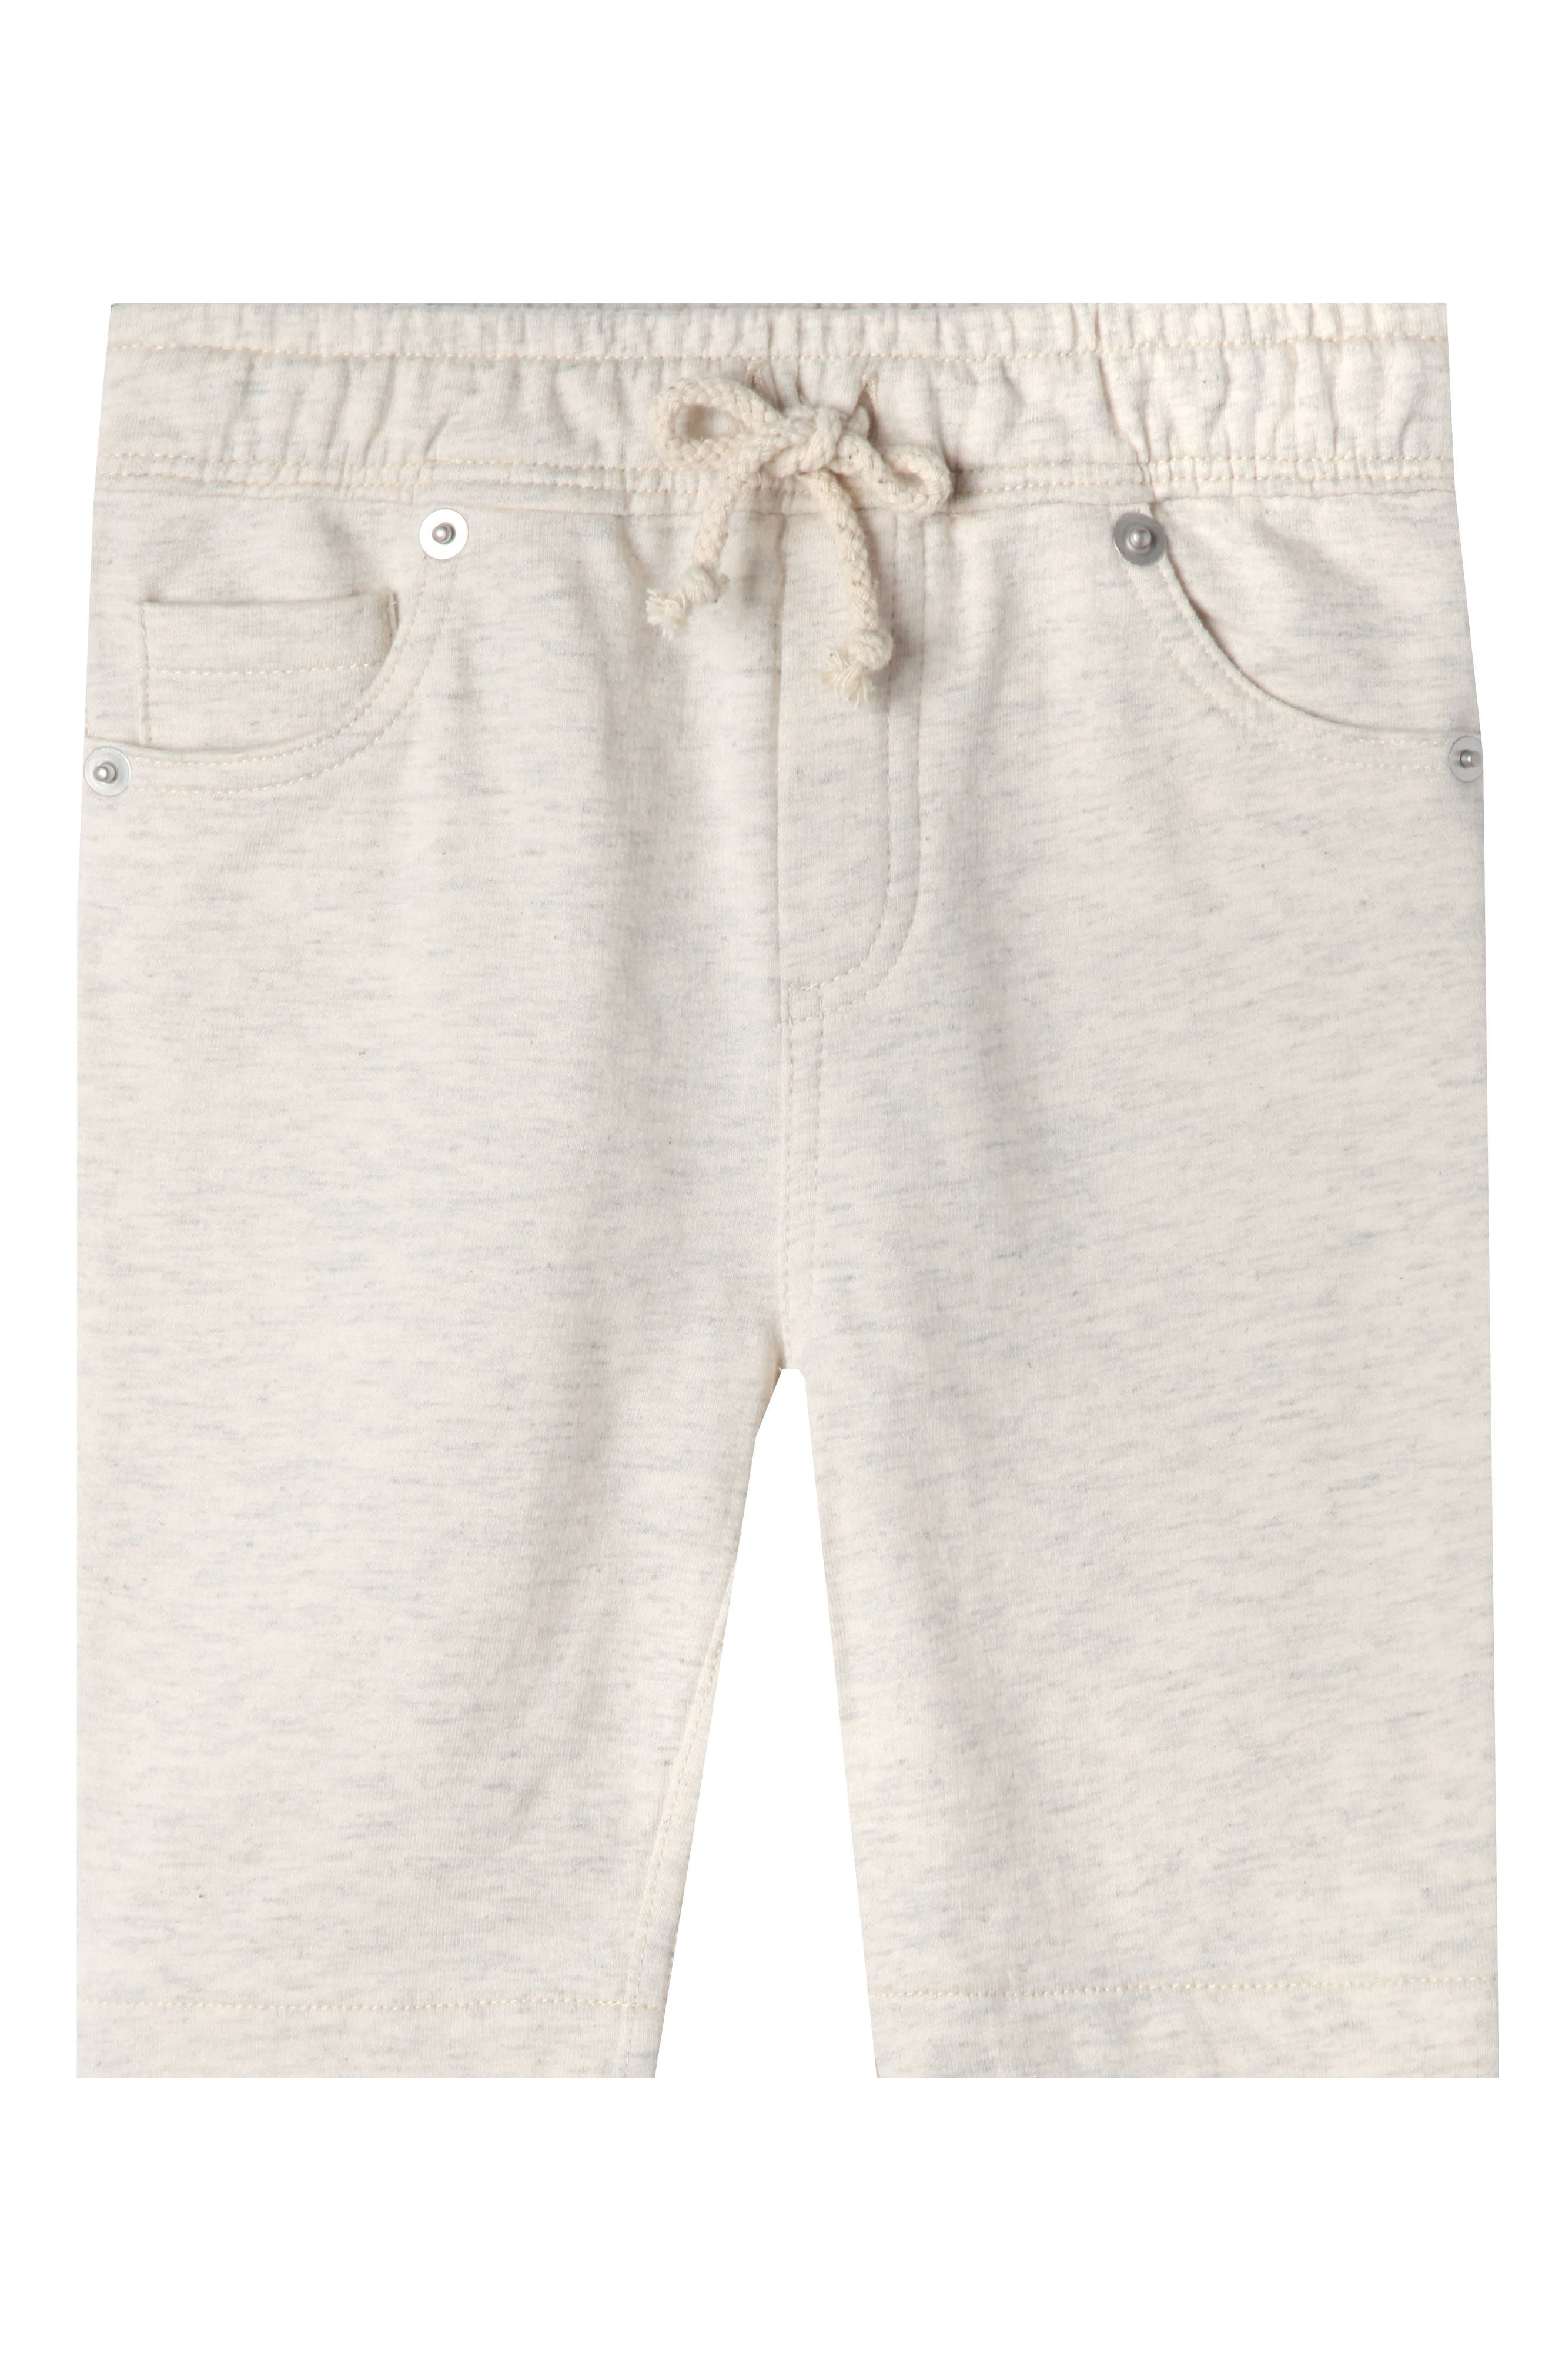 Luke Organic Cotton Shorts,                             Main thumbnail 1, color,                             OATMEAL HEATHER